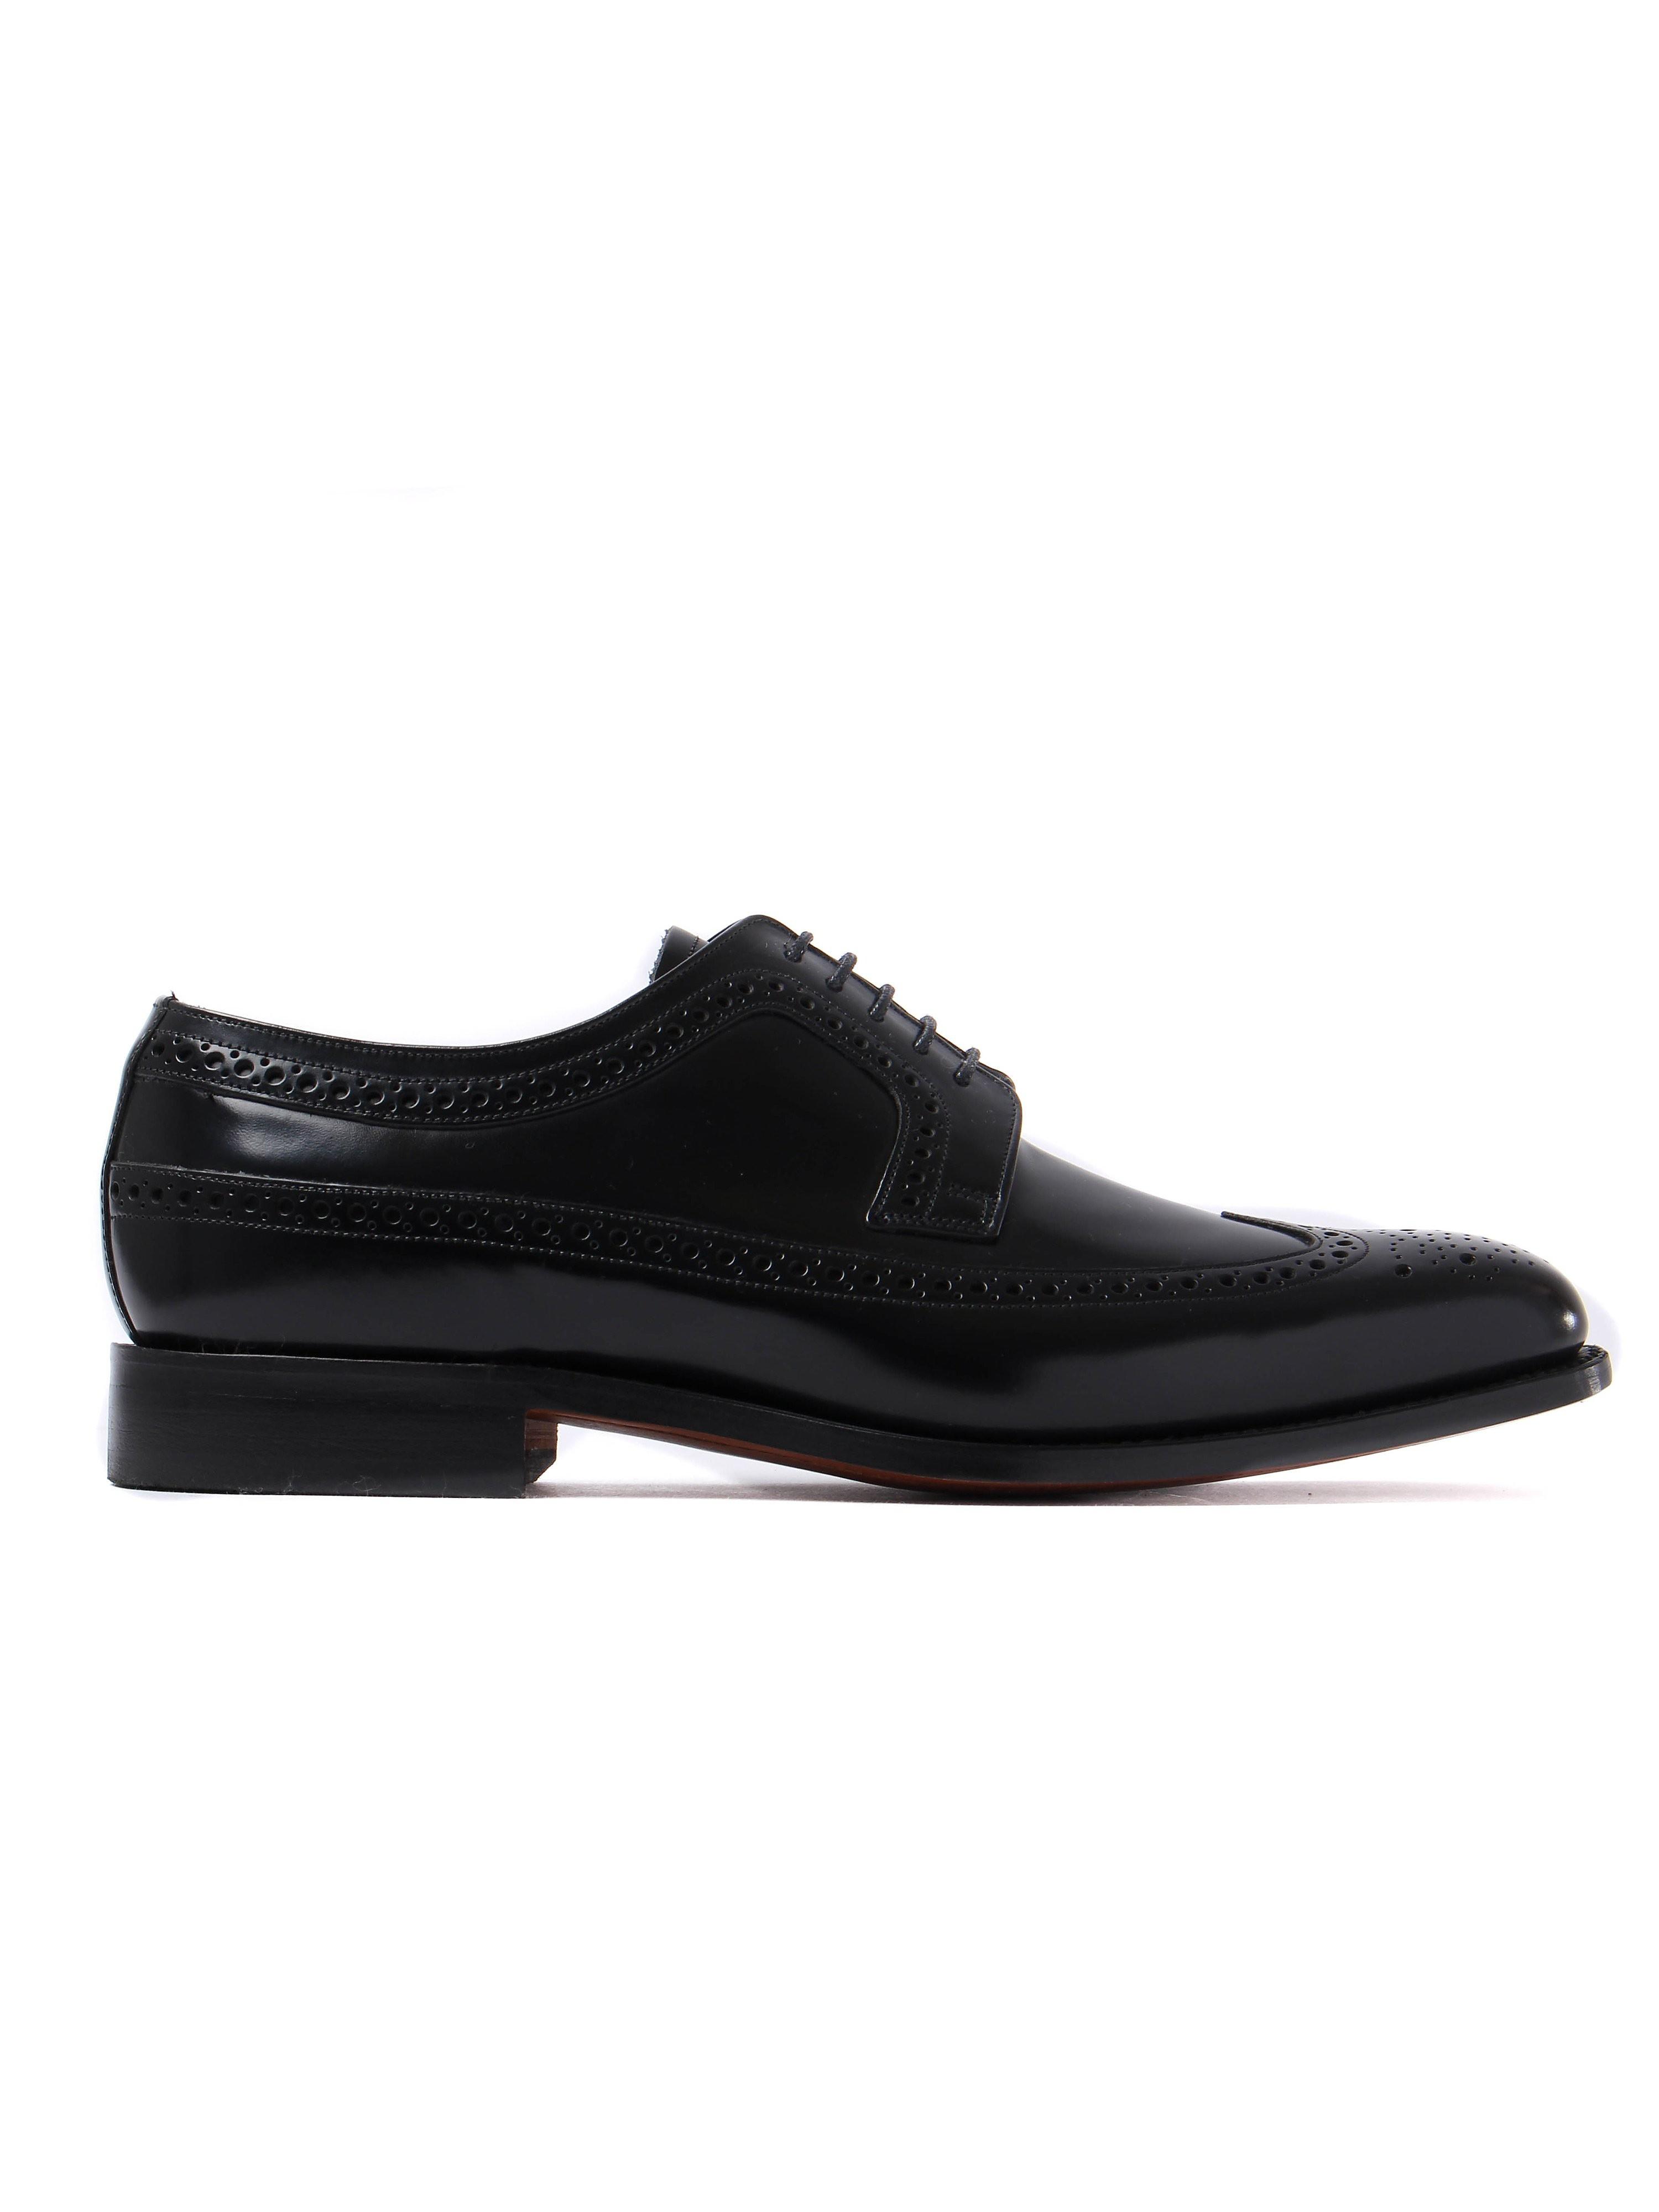 Barker Men's Woodbridge Leather Blucher Brogue - Black